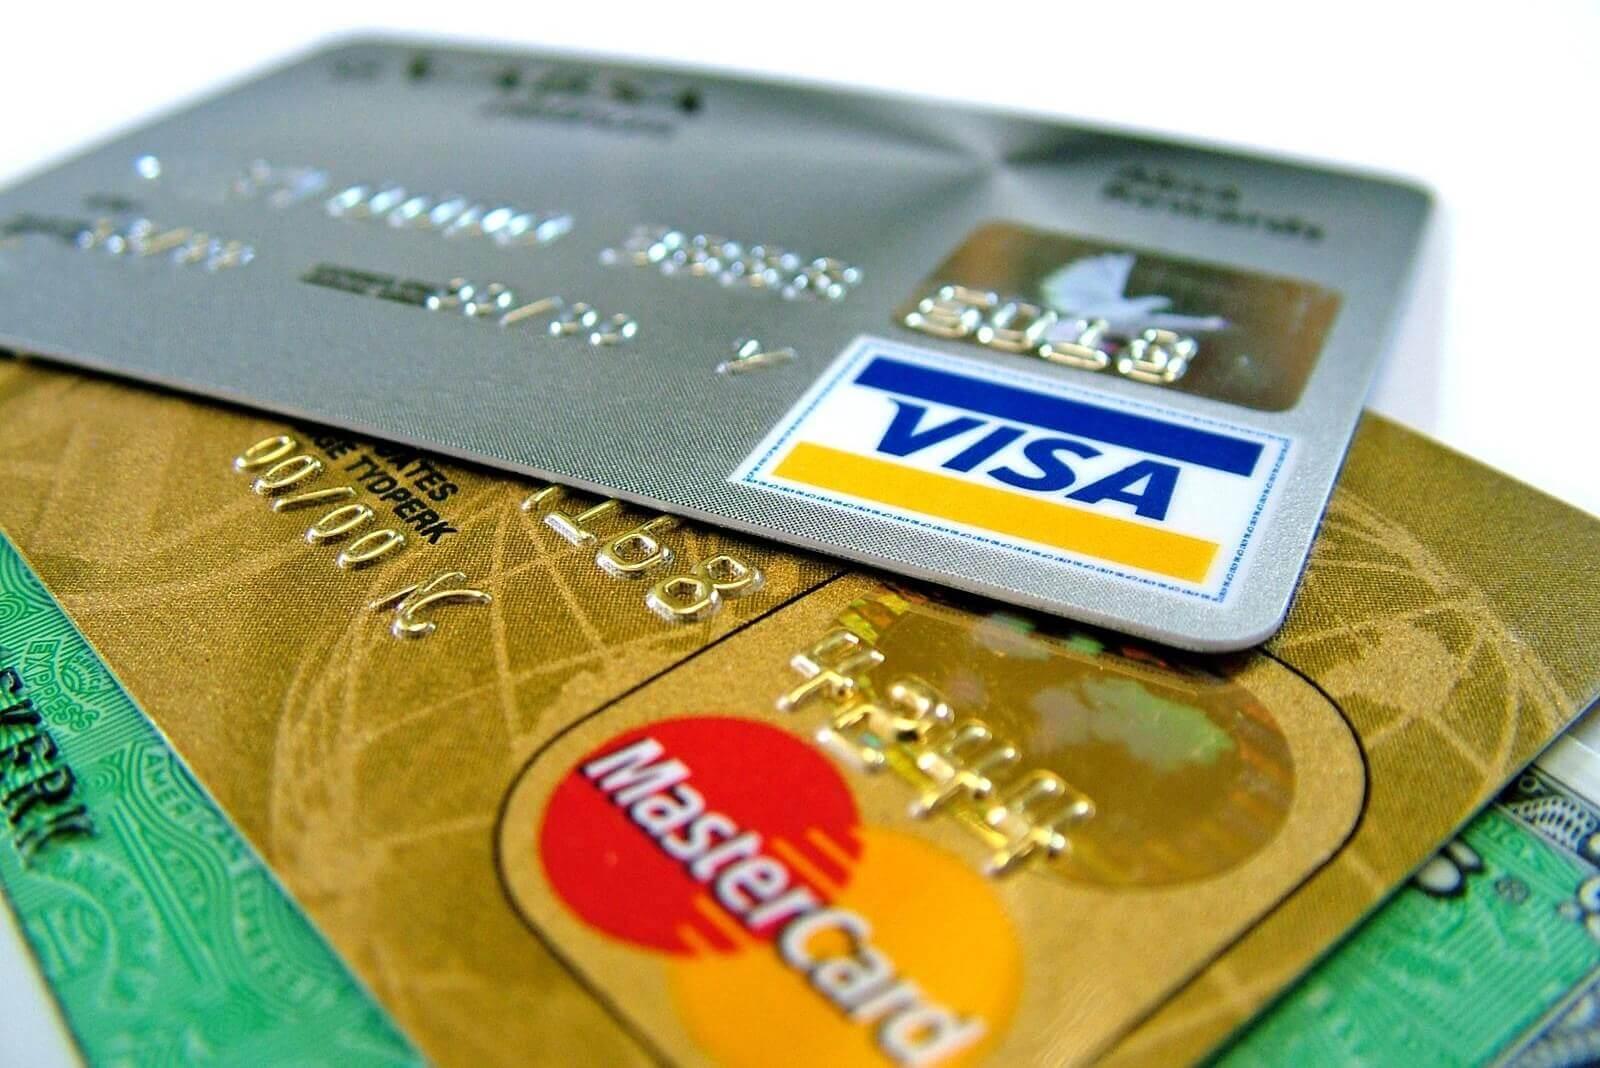 assurance voyage visa mastercard